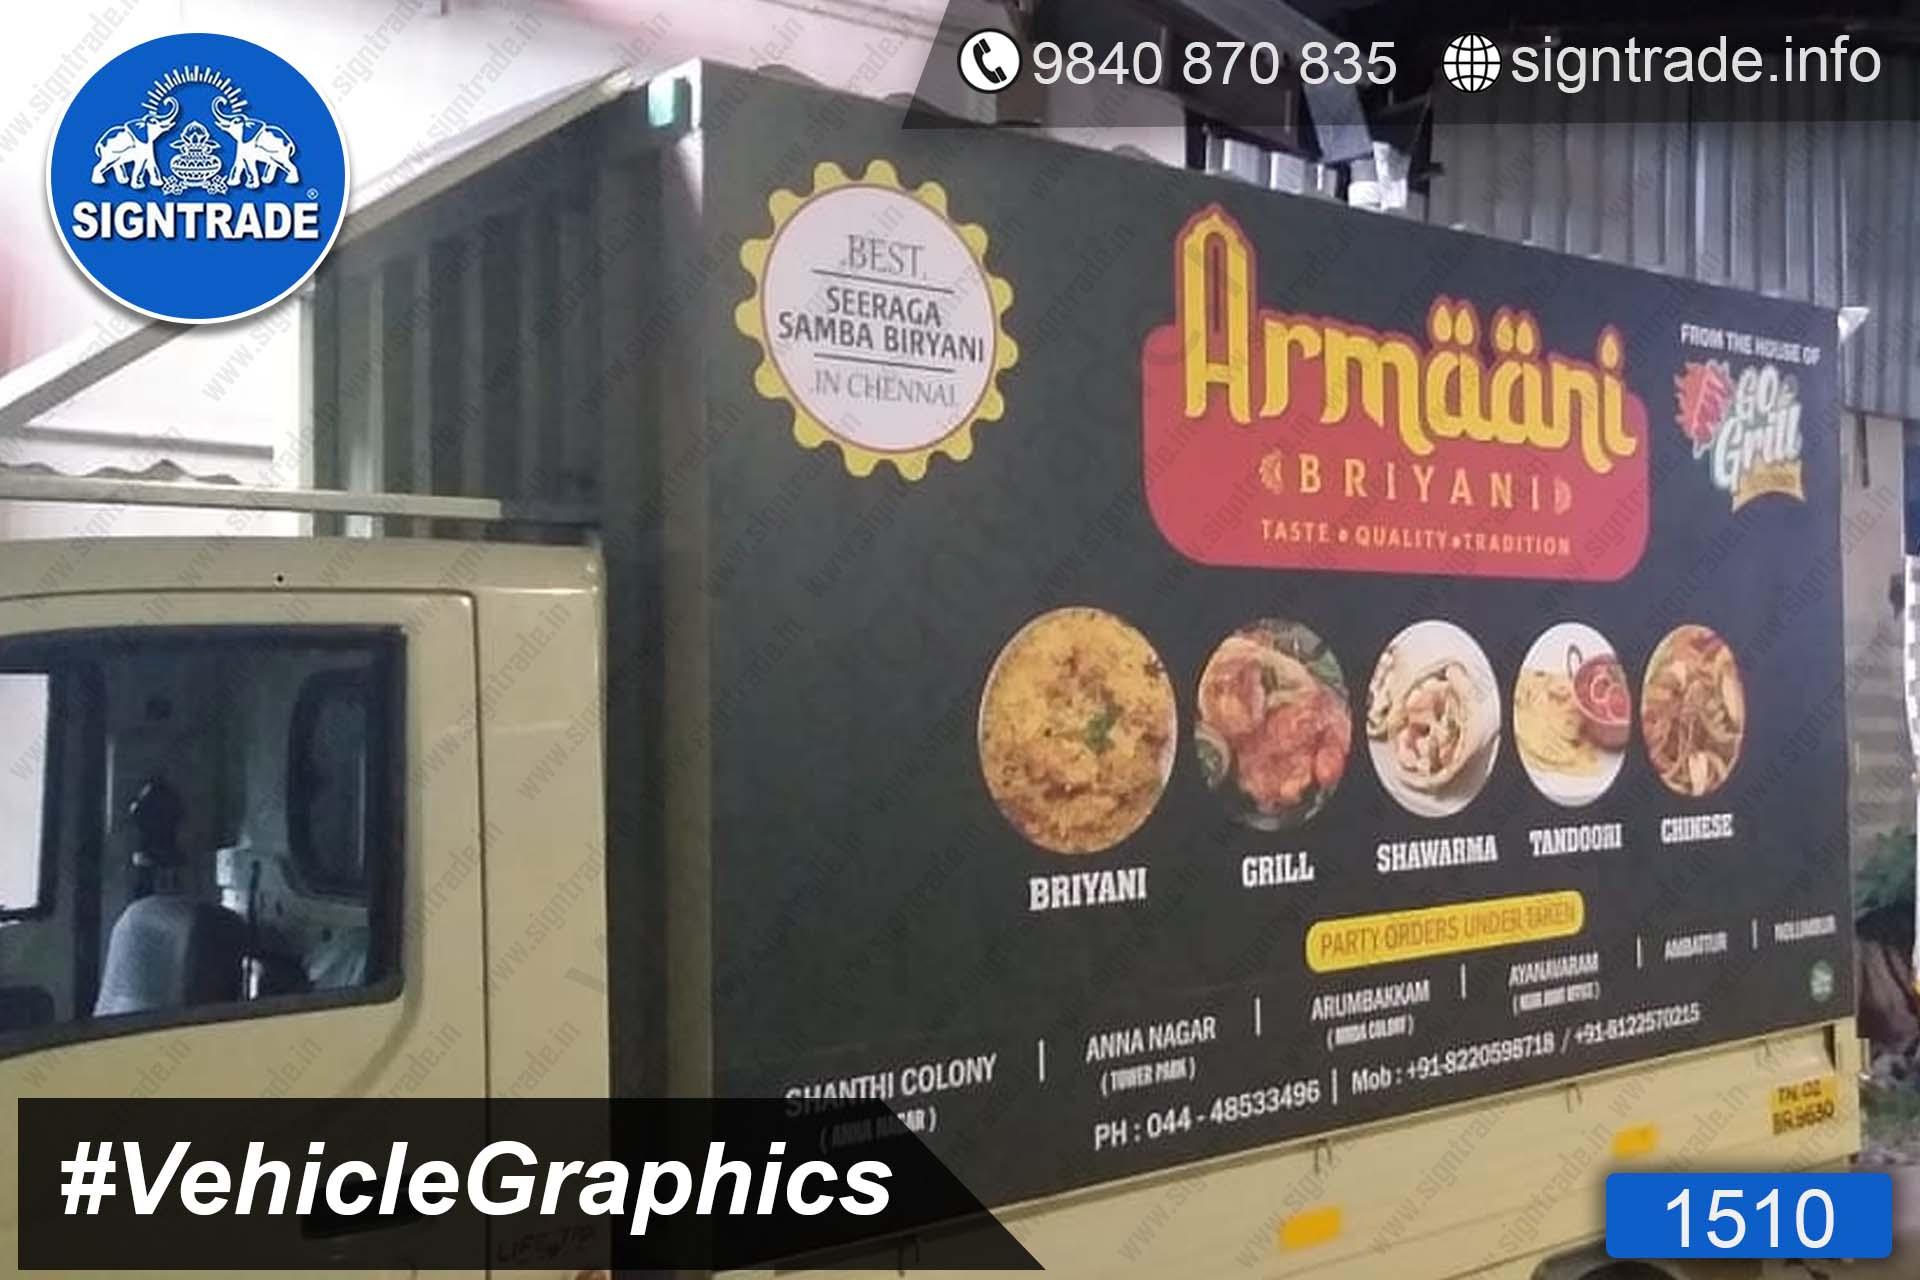 Armani Biryani, Chennai - SIGNTRADE - Vinyl, Stickers, Van Graphics, Vehicle Graphics and Wraps Service Provider in Chennai